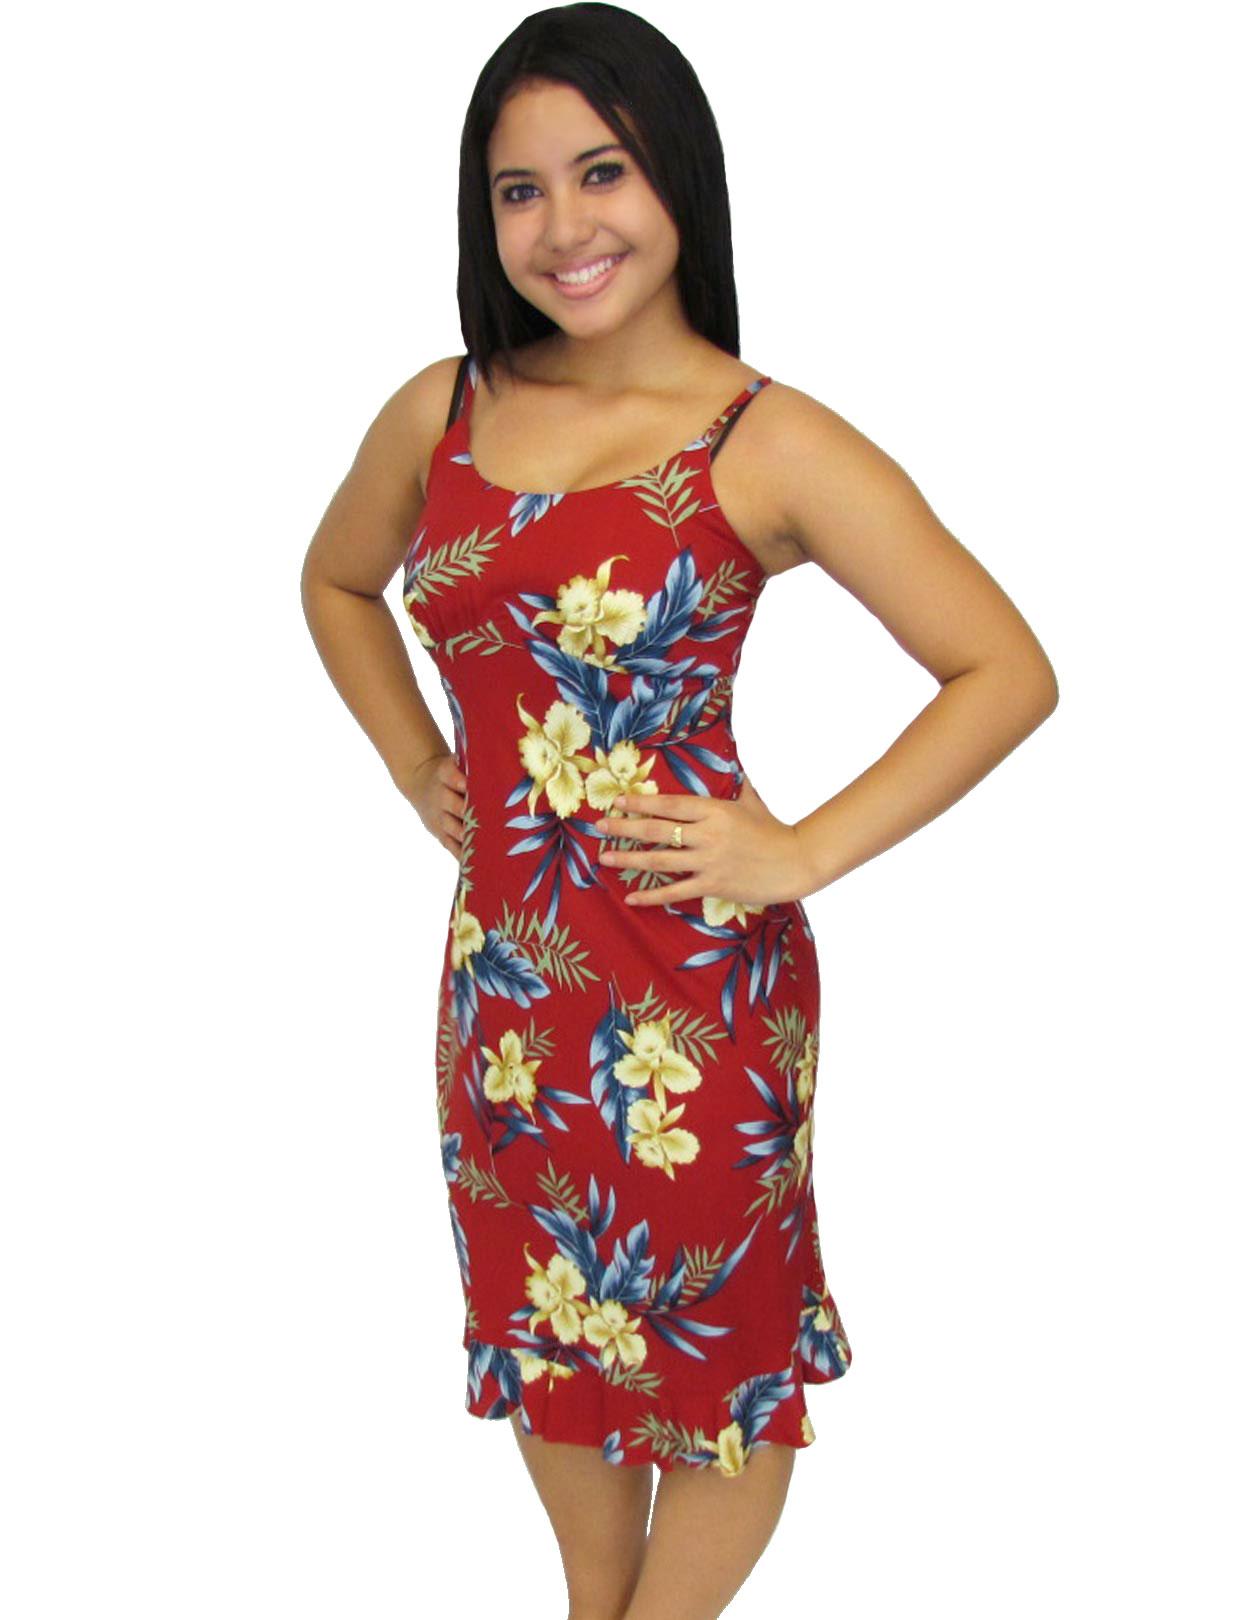 db433cd39a3 Rayon Midi Slip Spaghetti Straps Dress Okalani Red  Shaka Time Hawaii  Clothing Store